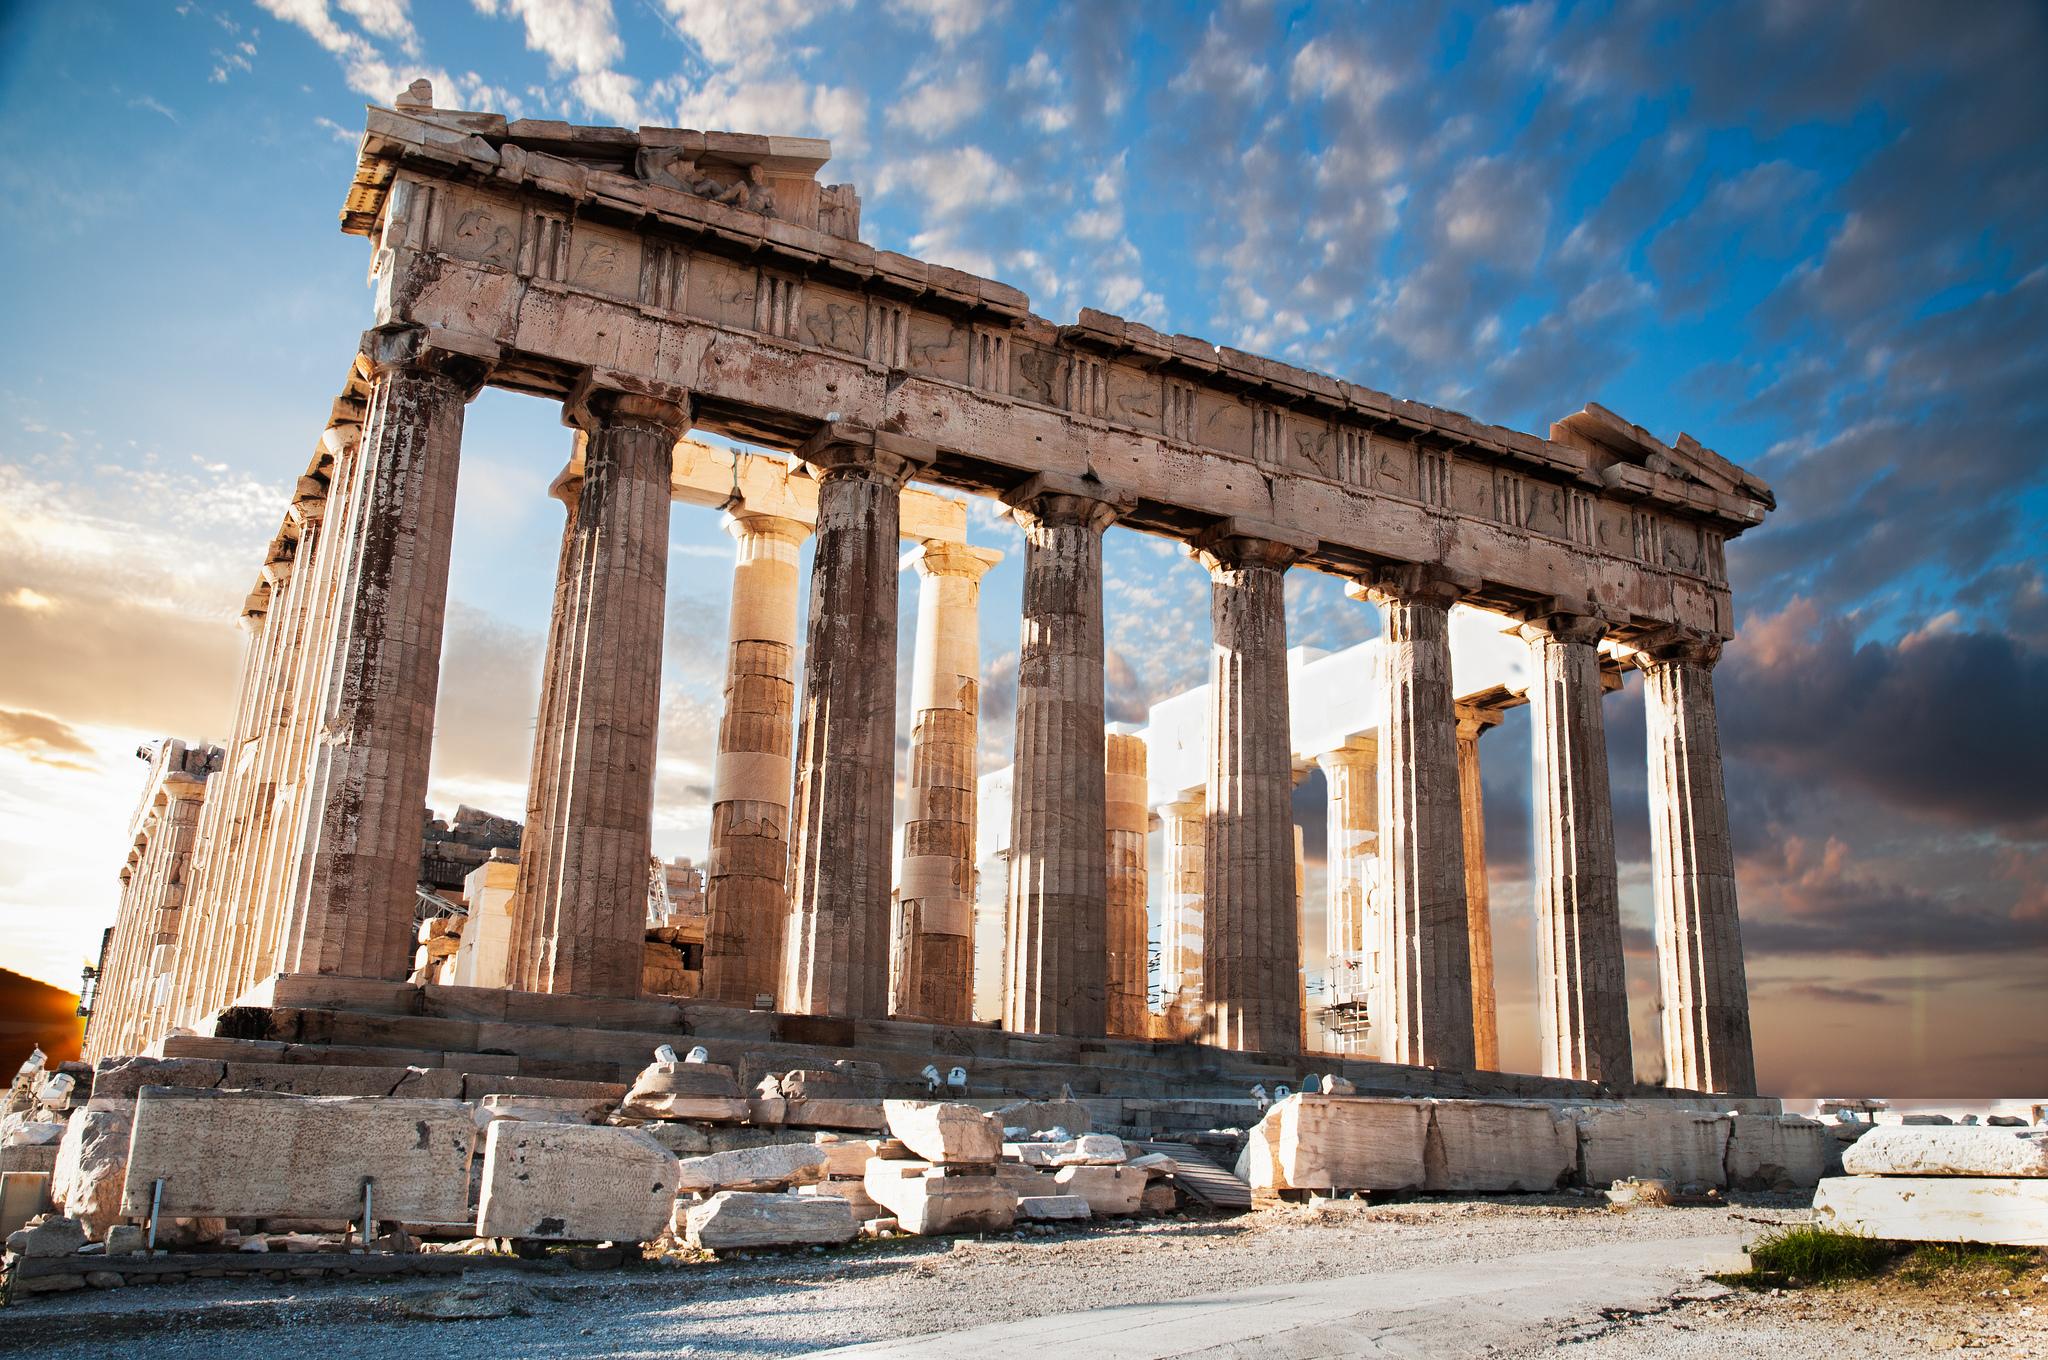 greek architecture crystalinks - HD1787×1187